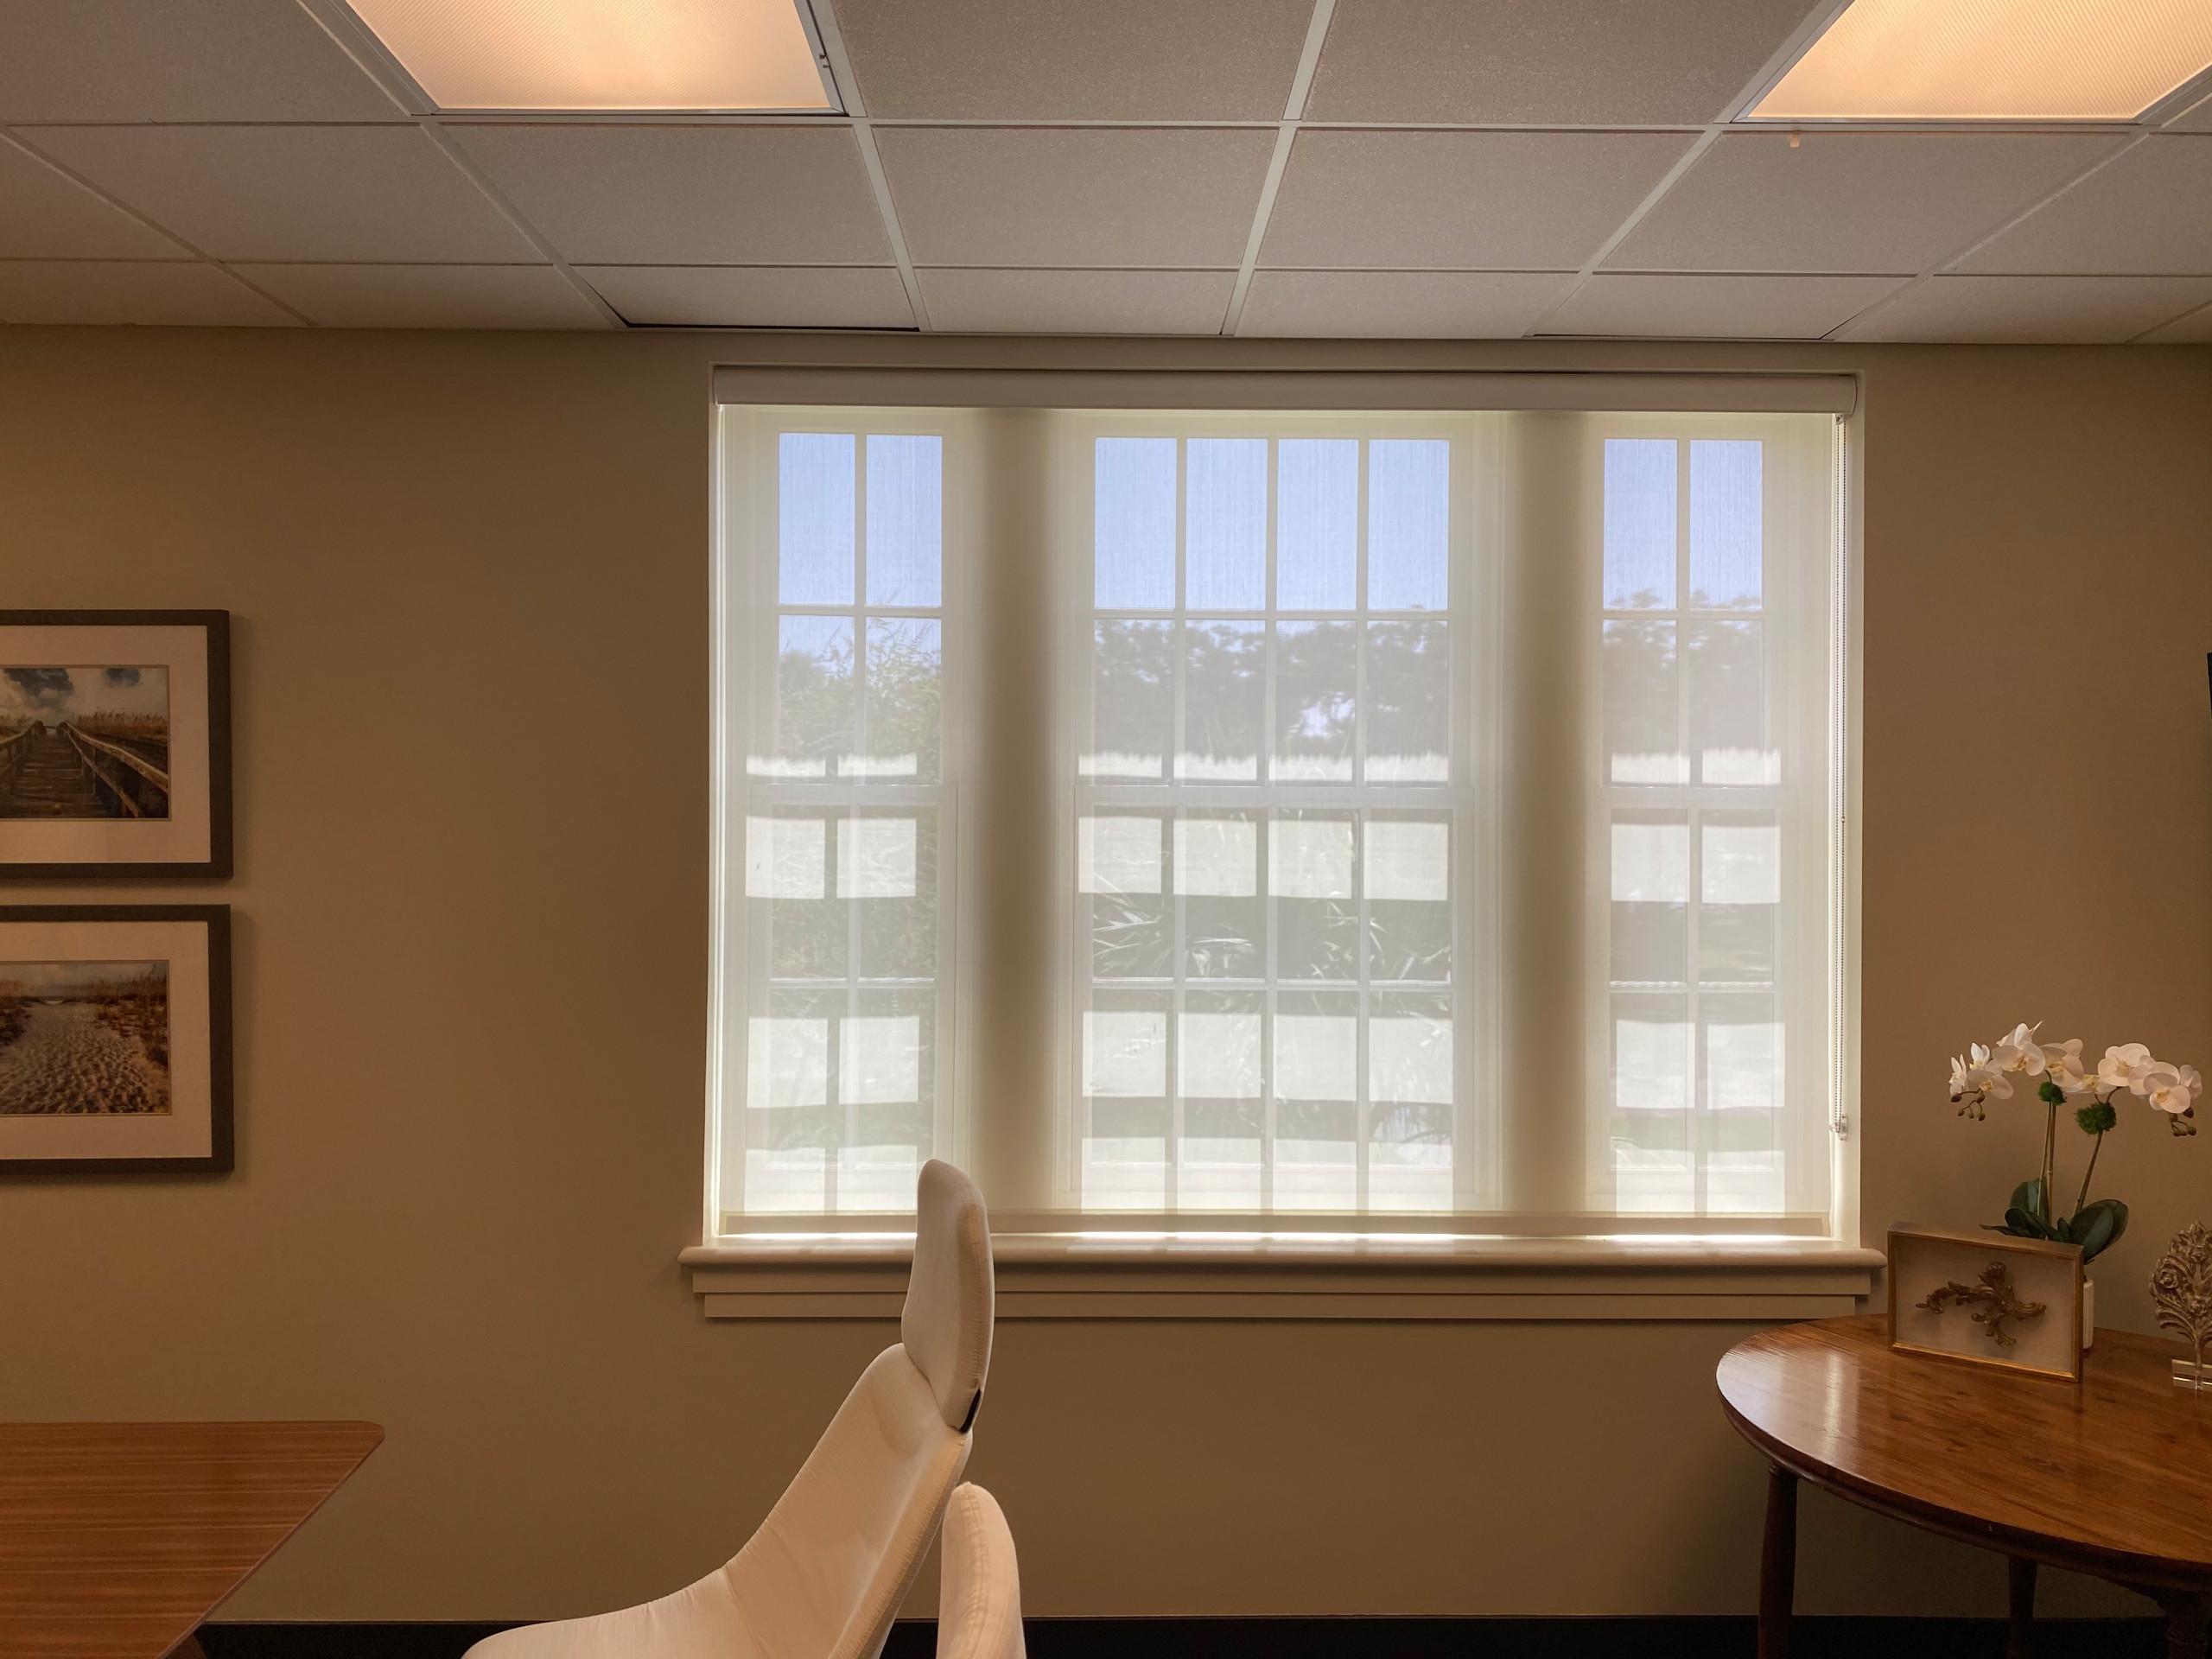 Office Room Sun Shades